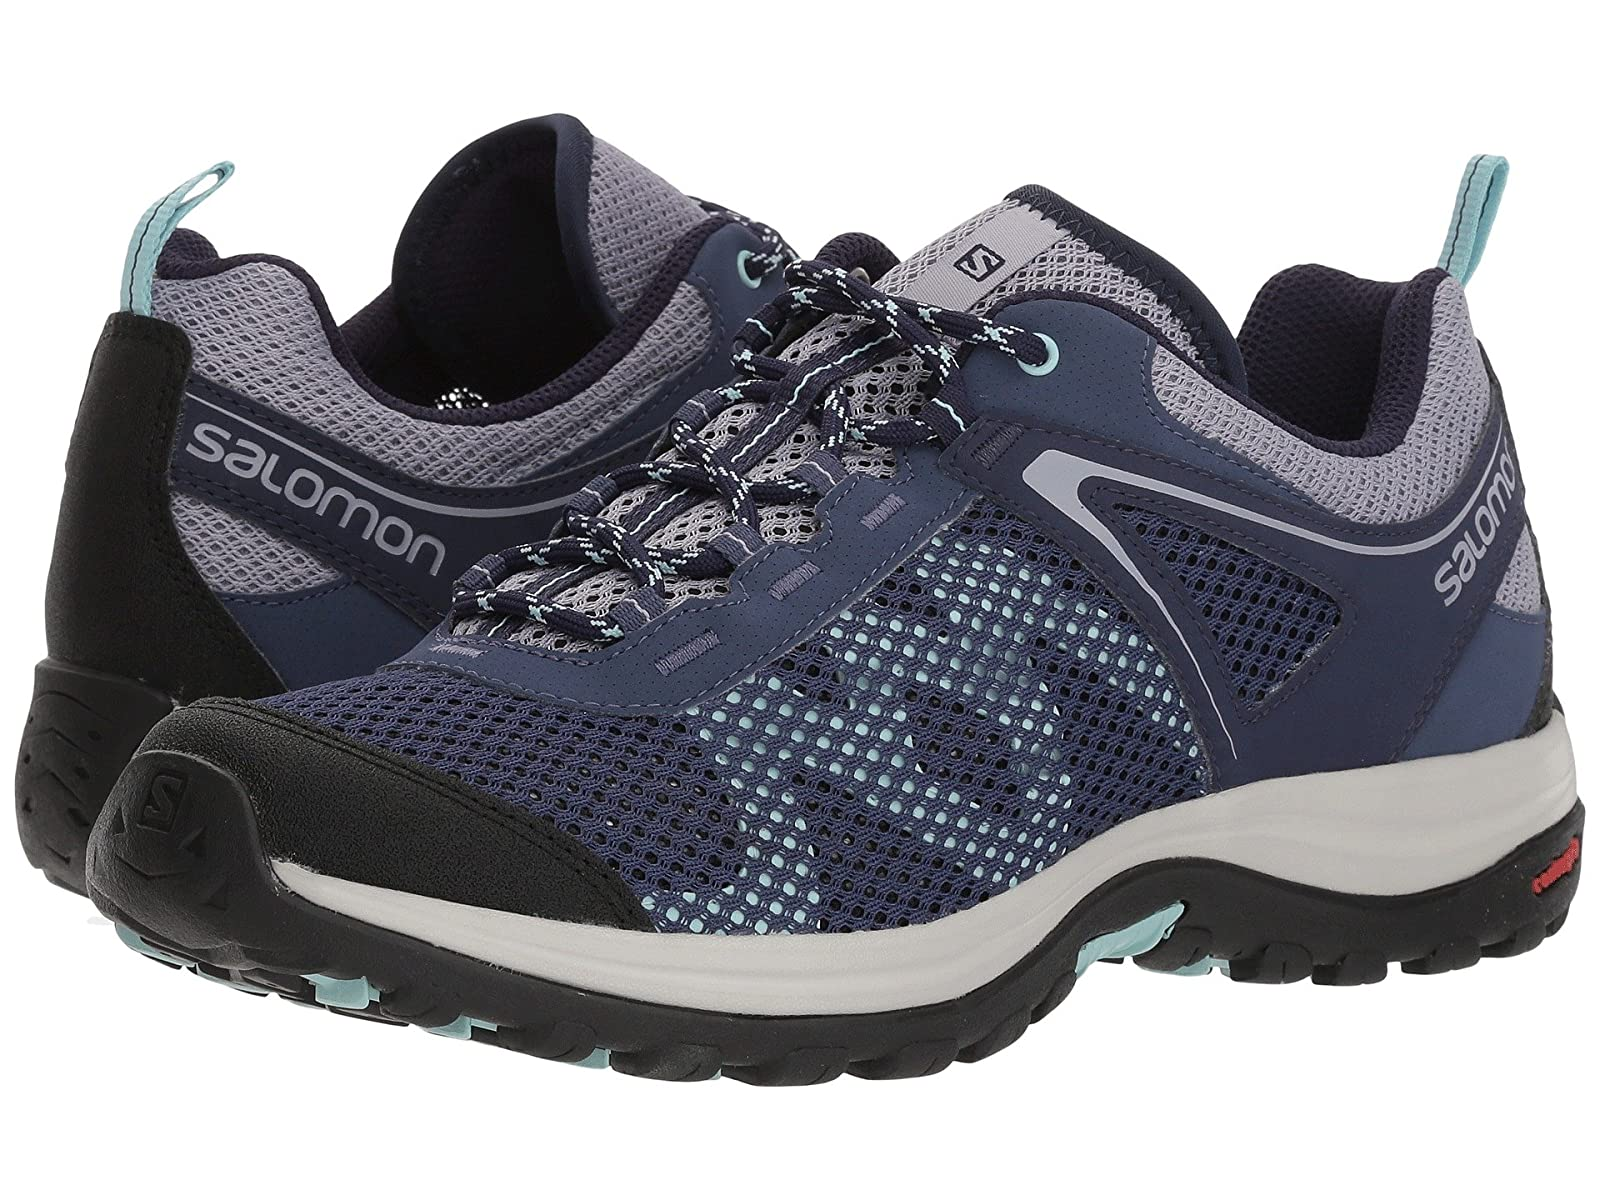 Salomon Ellipse MehariAtmospheric grades have affordable shoes